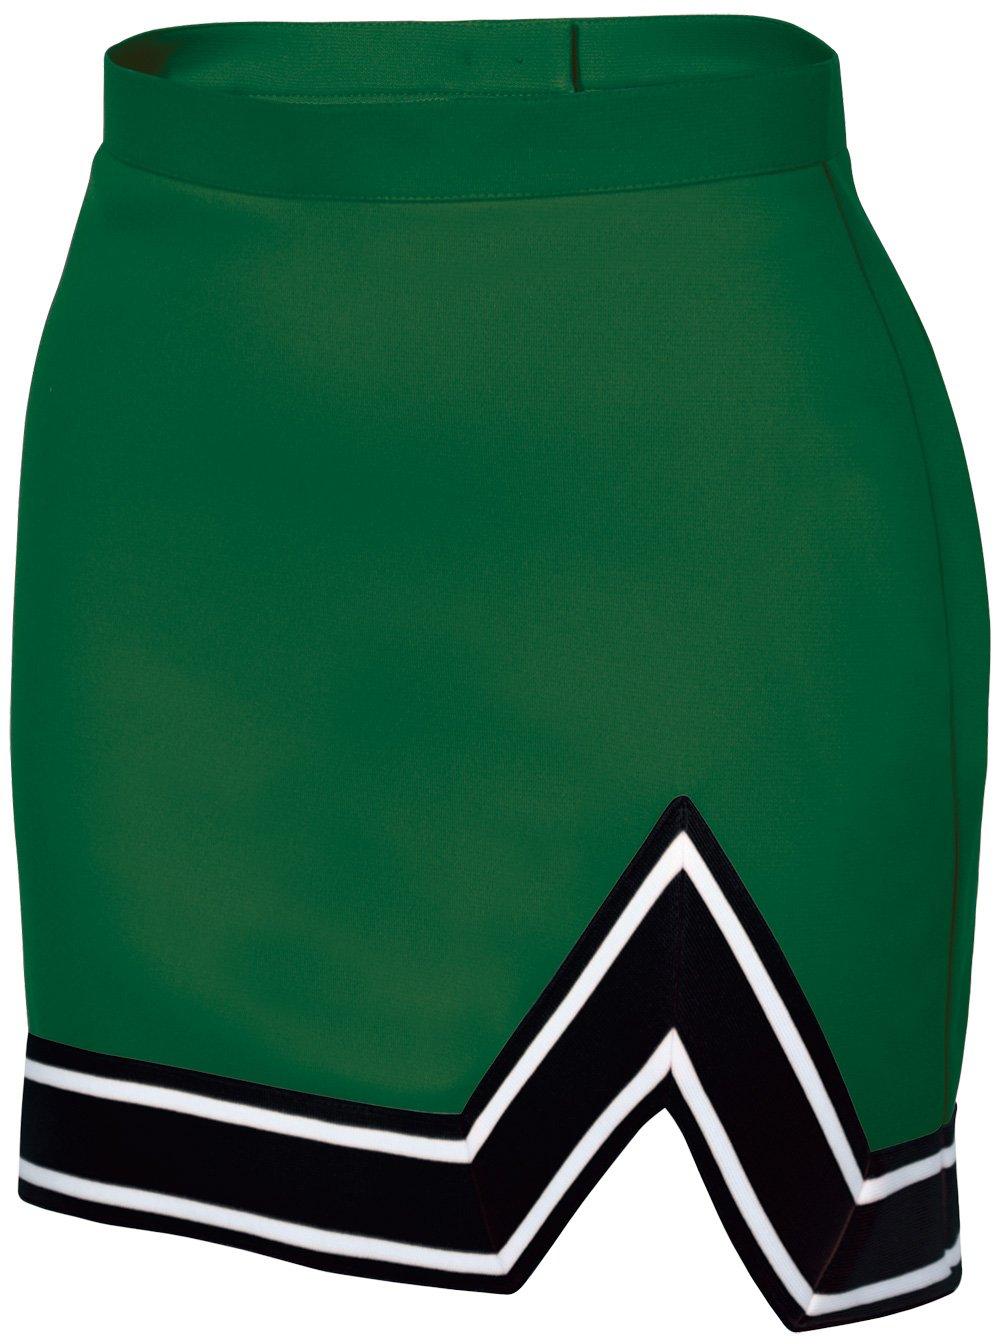 Chassé Womens' Blaze Skirt Dark Green/White/Black Adult X-Small